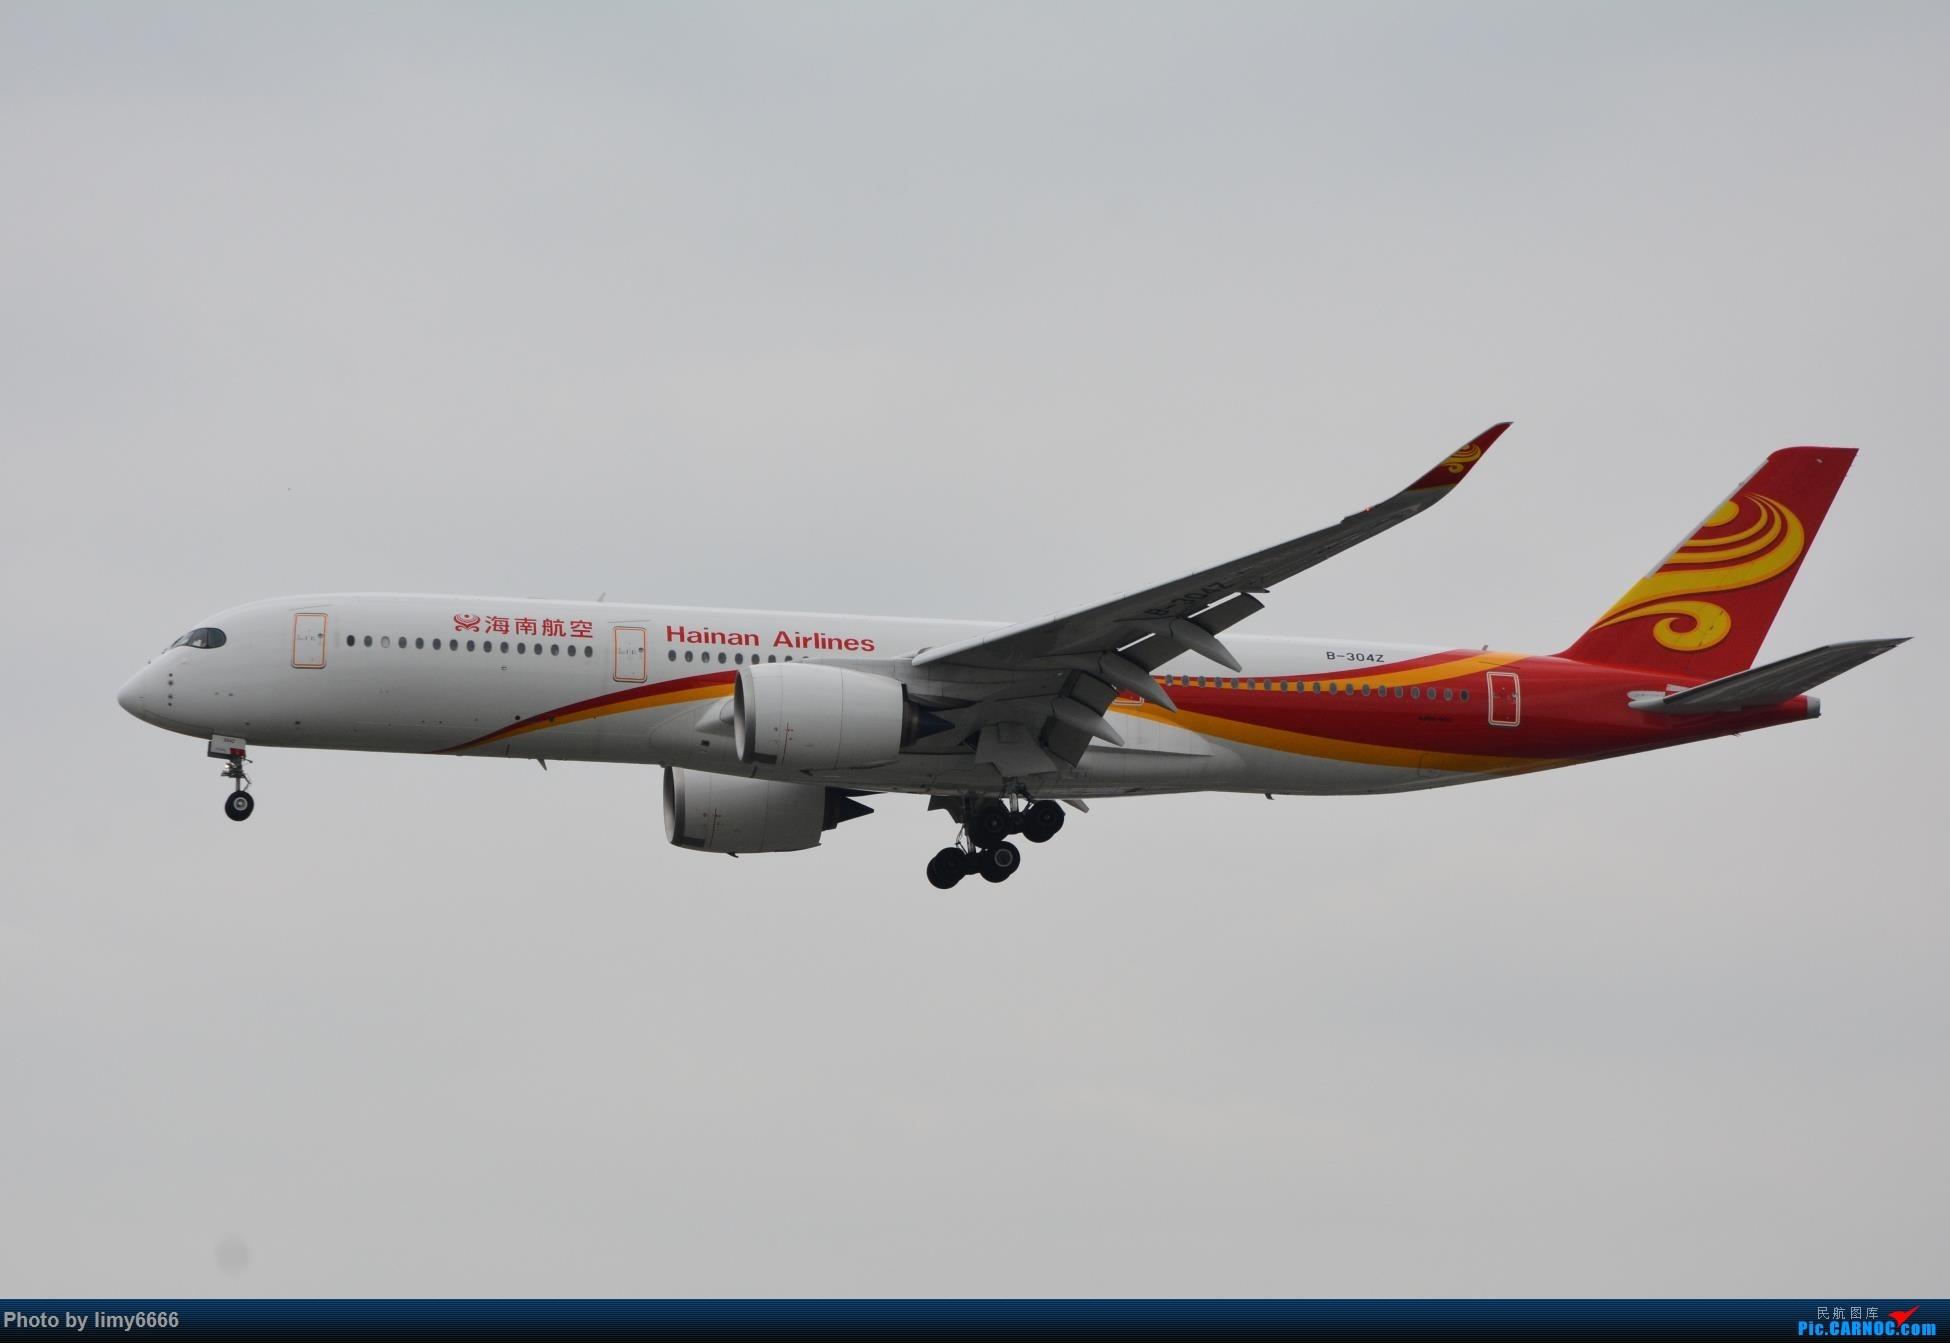 Re:[原创]上海虹桥机场拍机(在贵阳很少见或看不见的) AIRBUS A350-900 B-304Z 中国上海虹桥国际机场